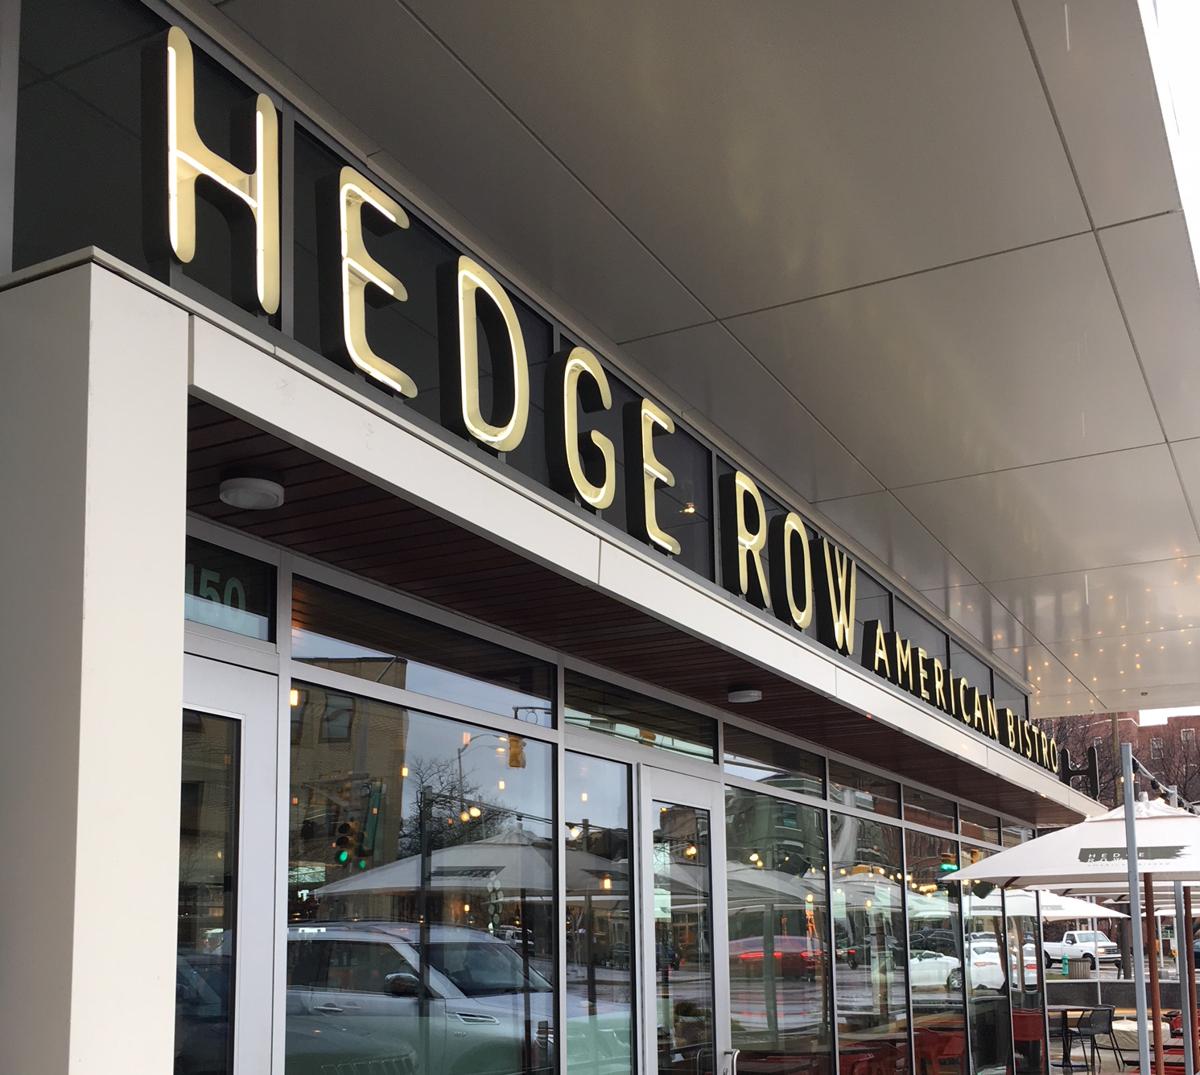 Hedge Row